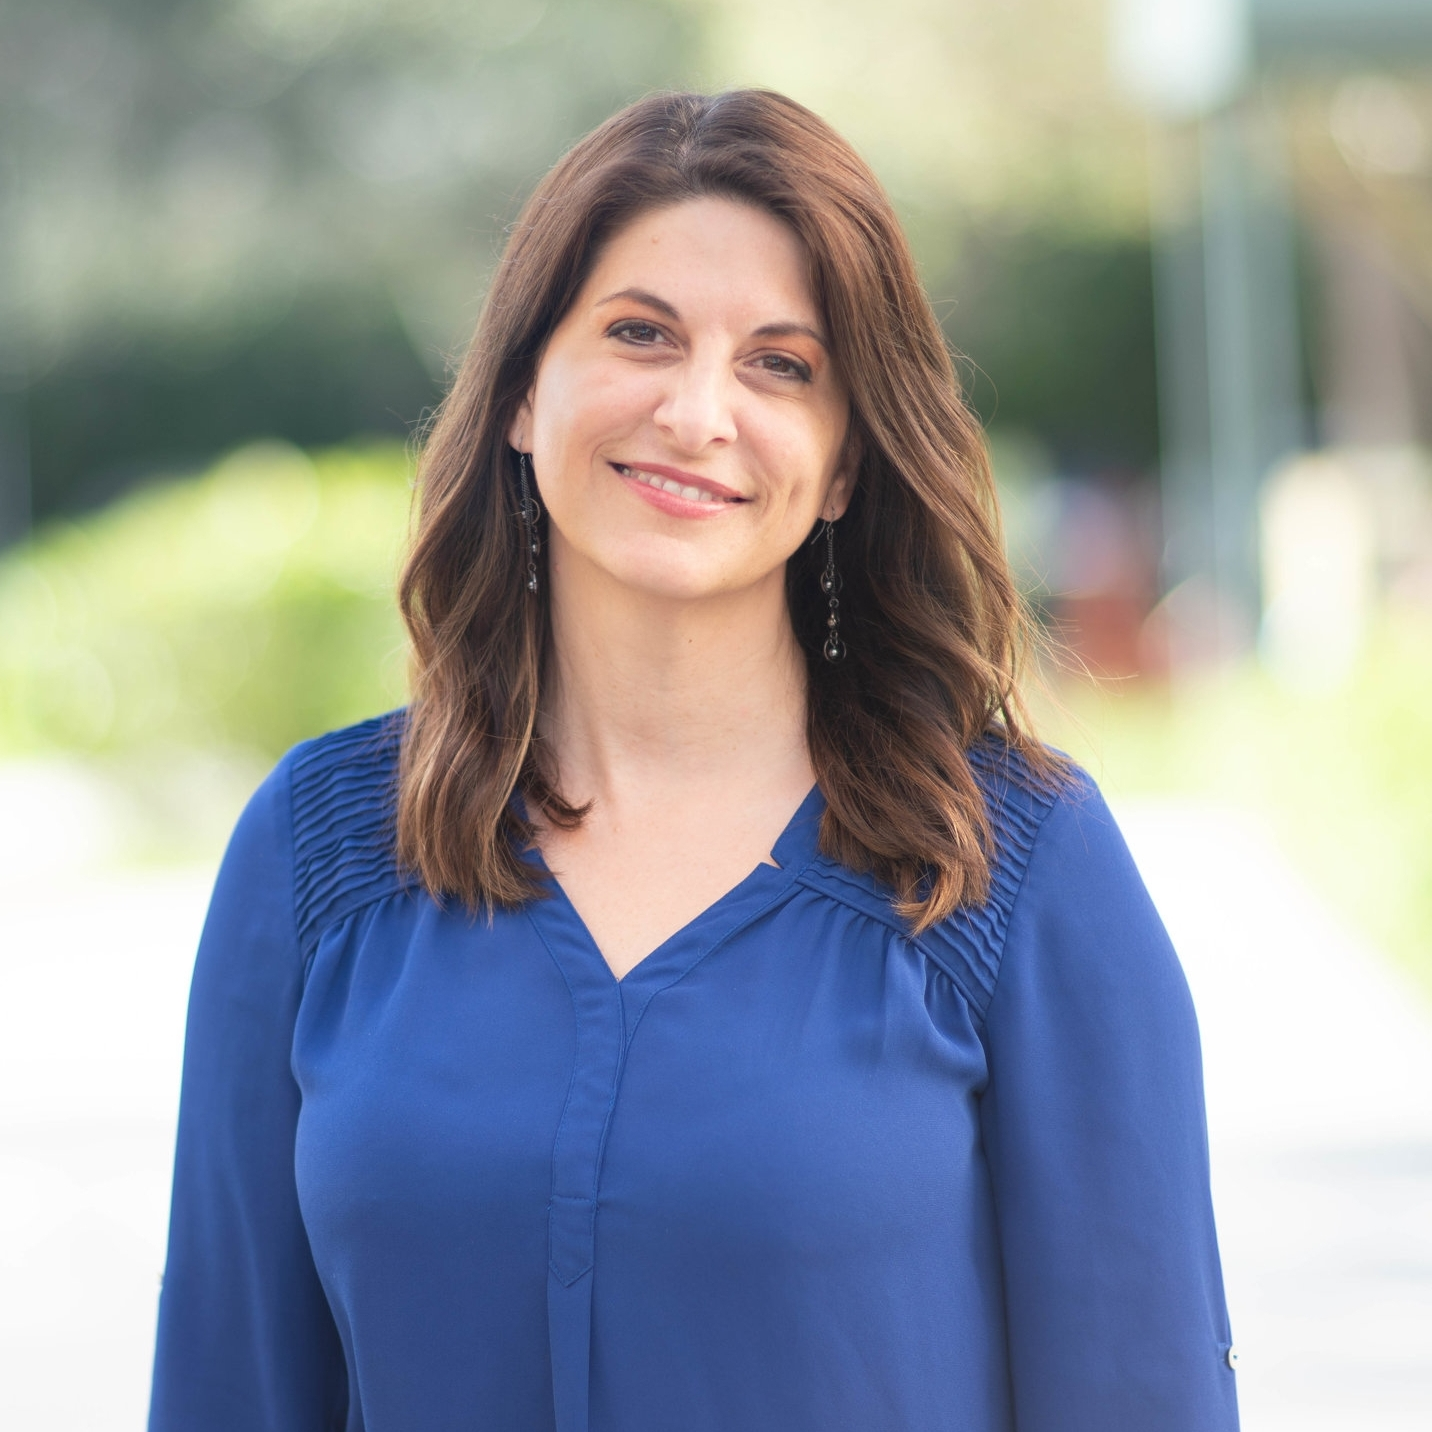 Lara Wobb - Director of Children's Ministry